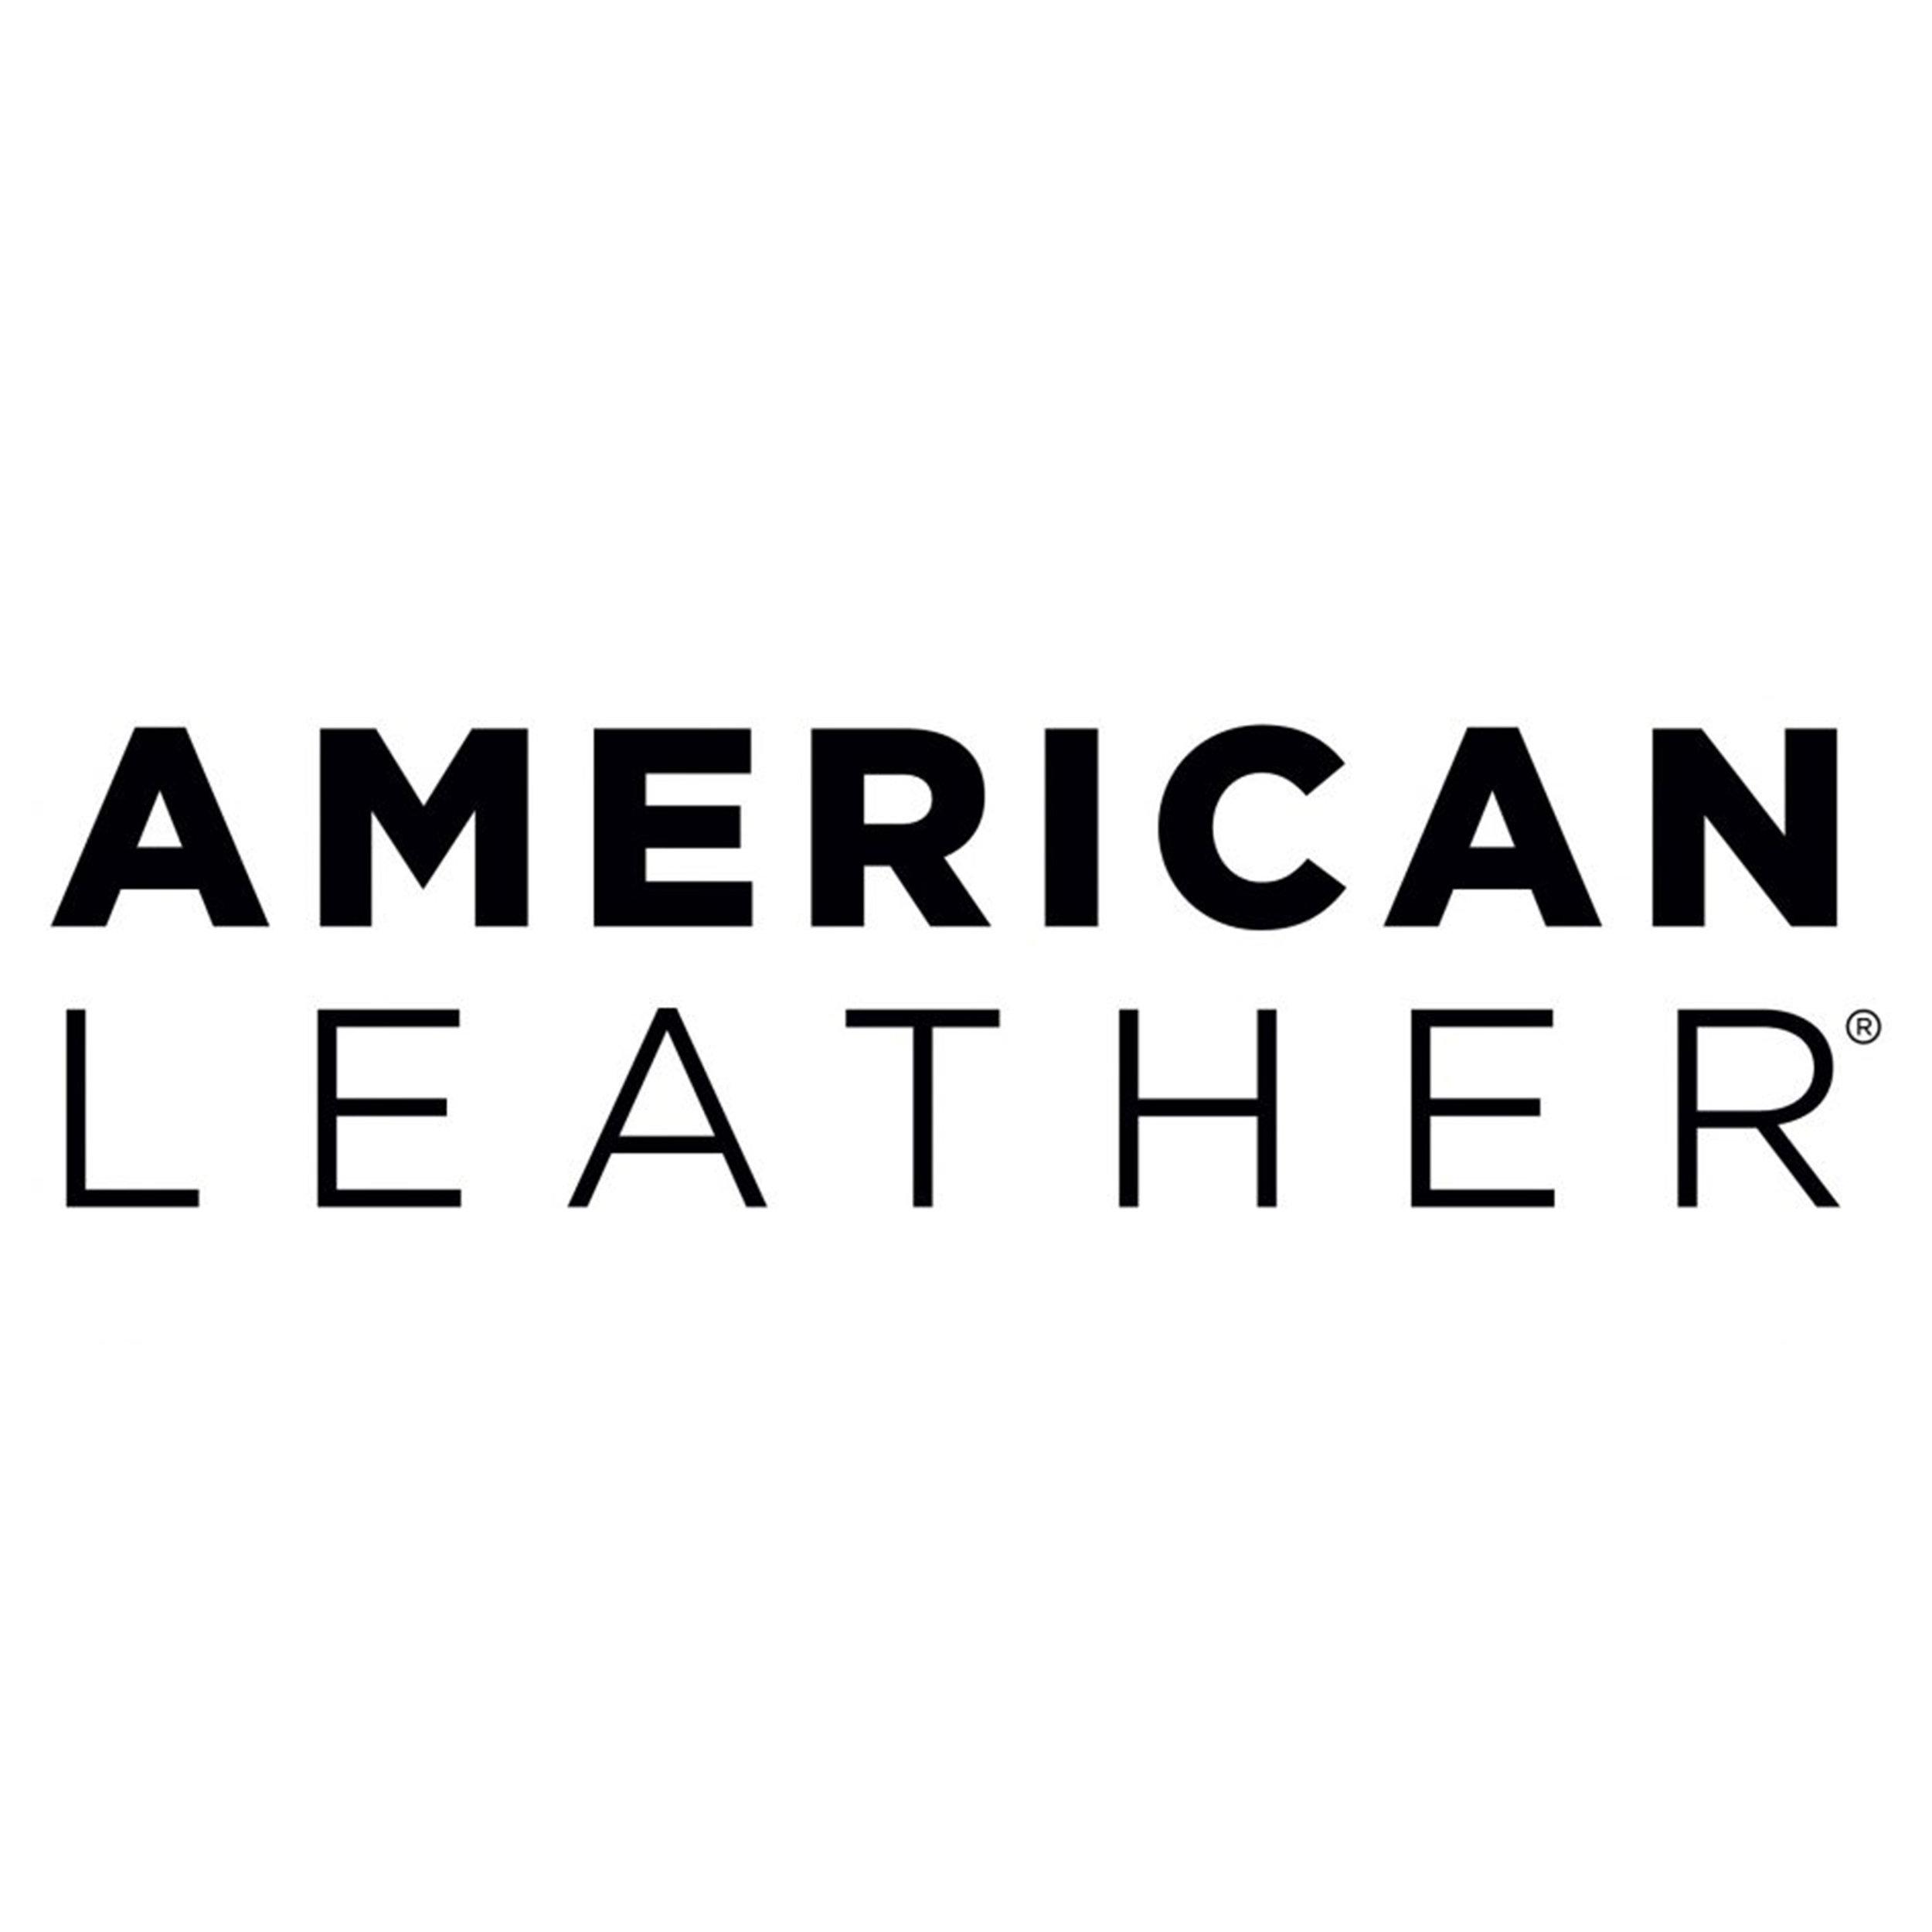 American Leather.jpg